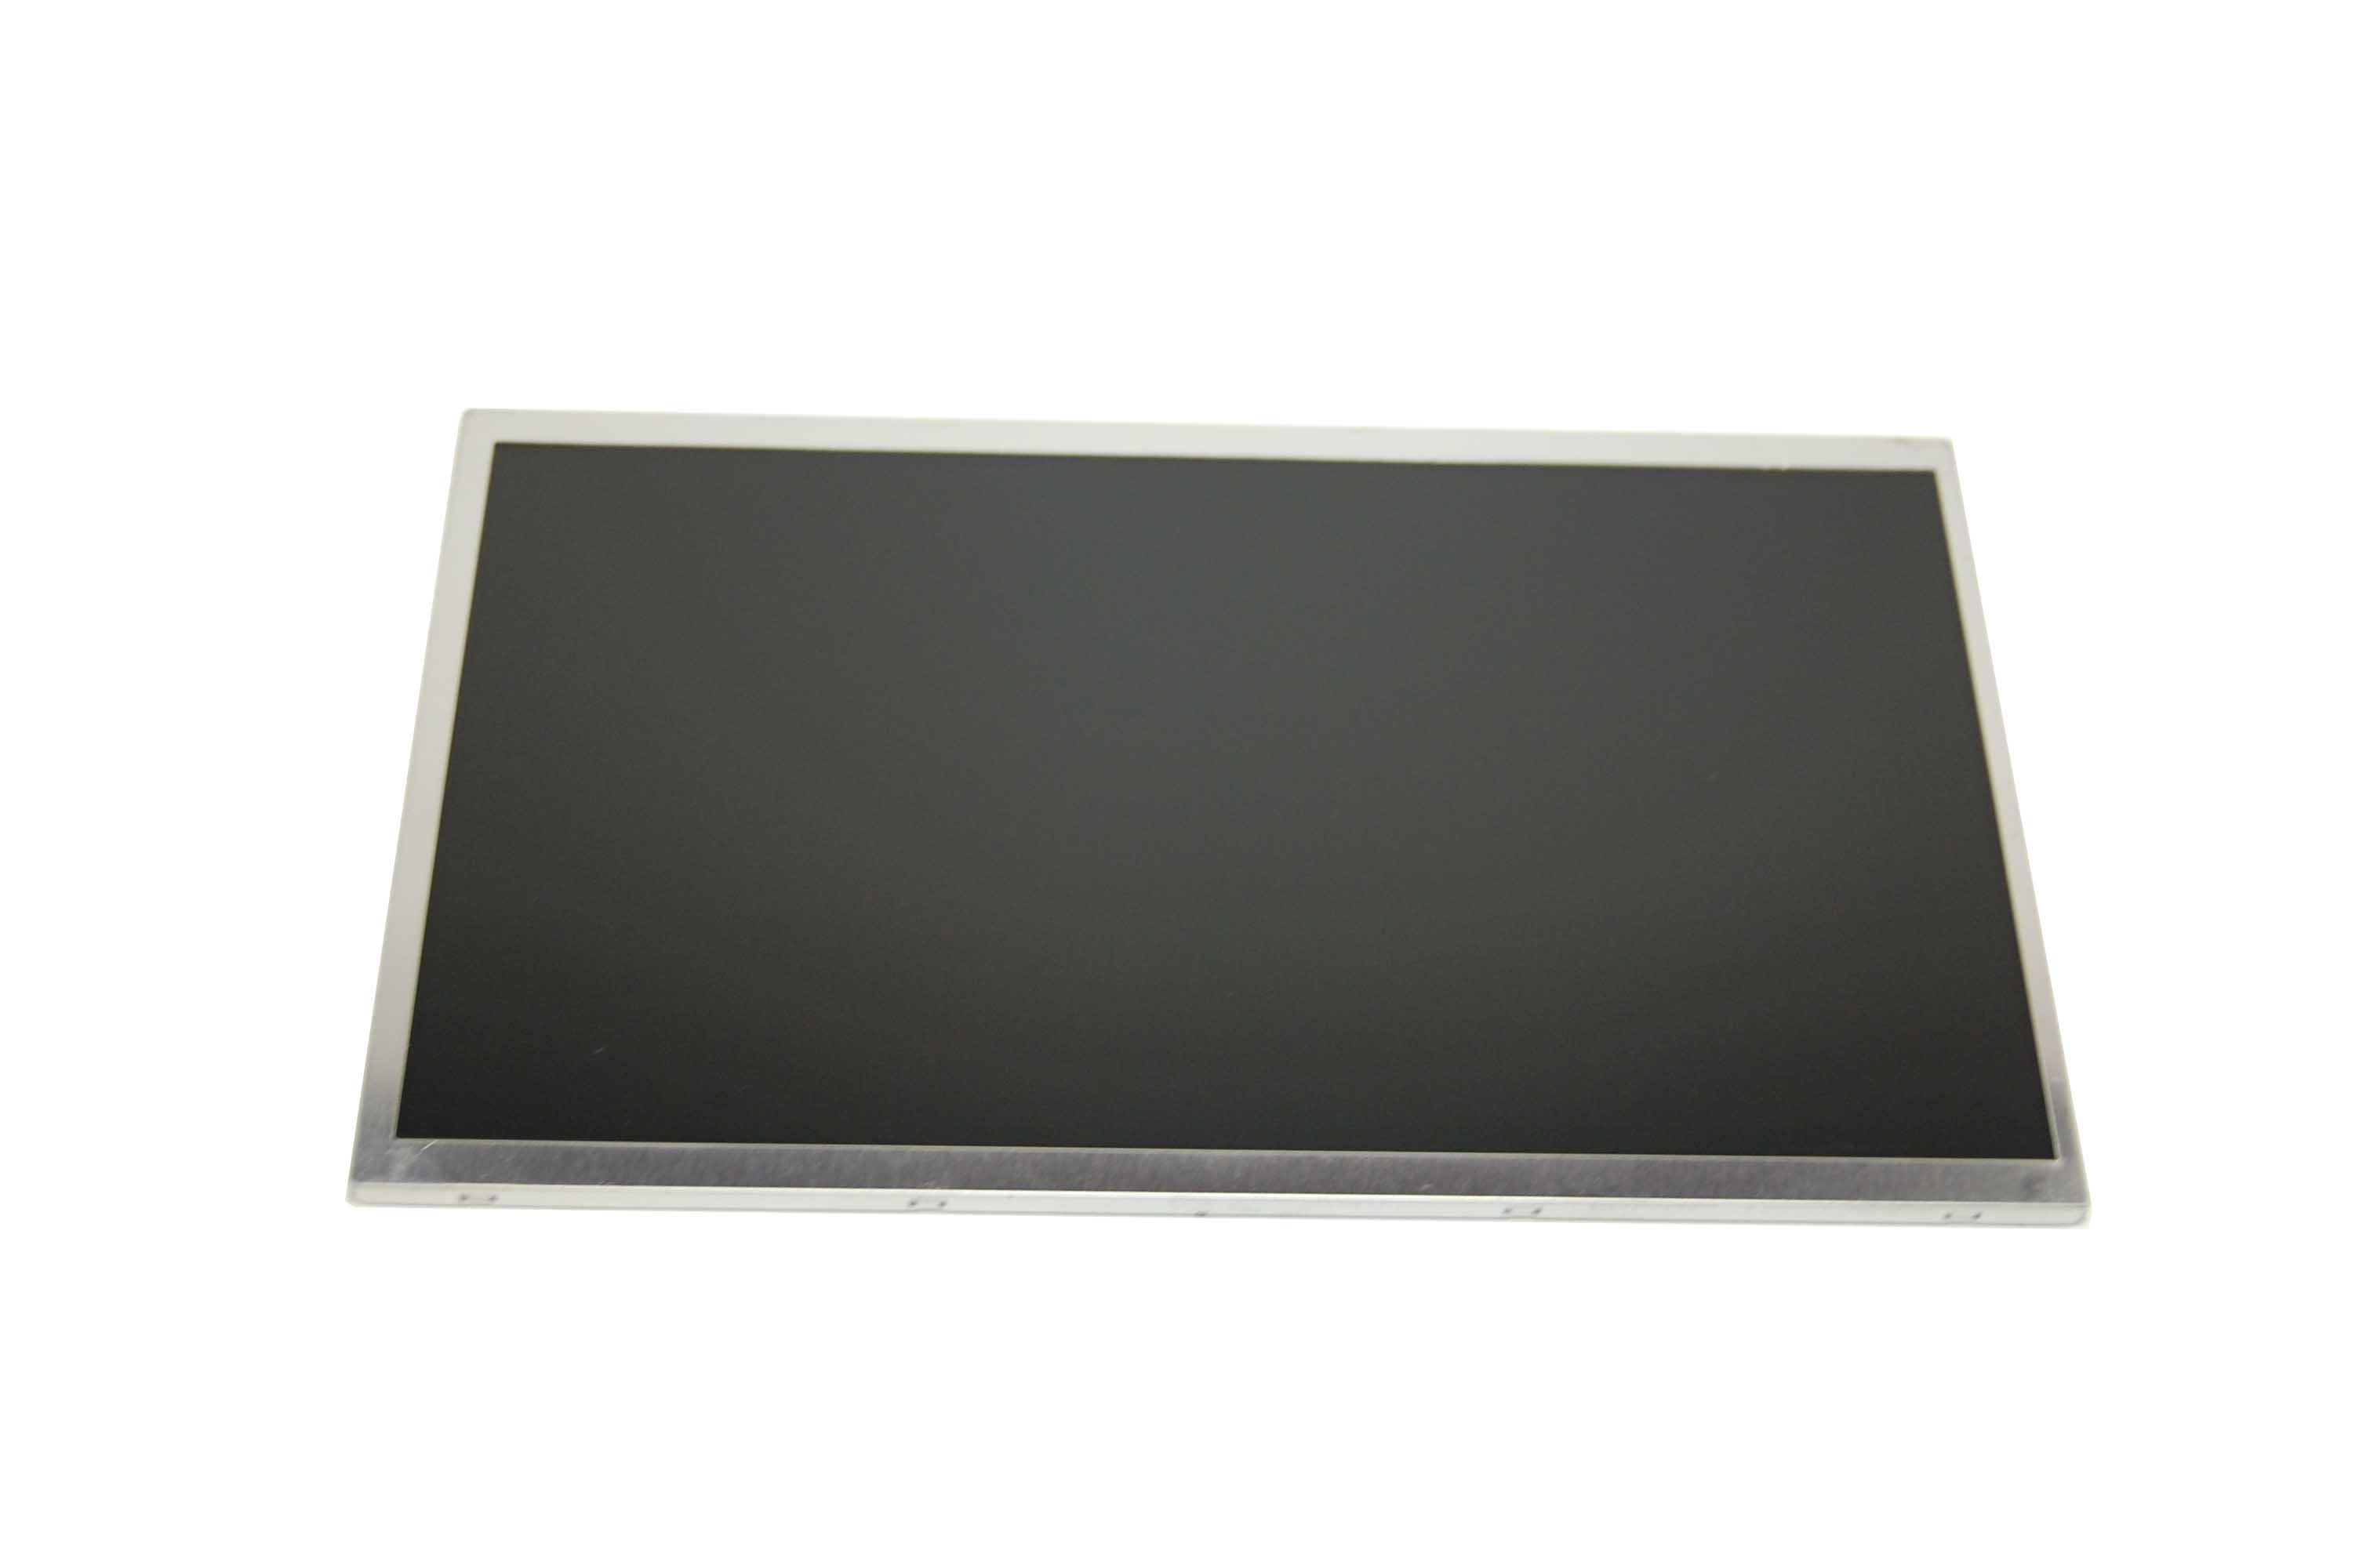 "HannStar HSD101PFW1-A01 Display LCD 10,1"" 1024x576 LED matt"